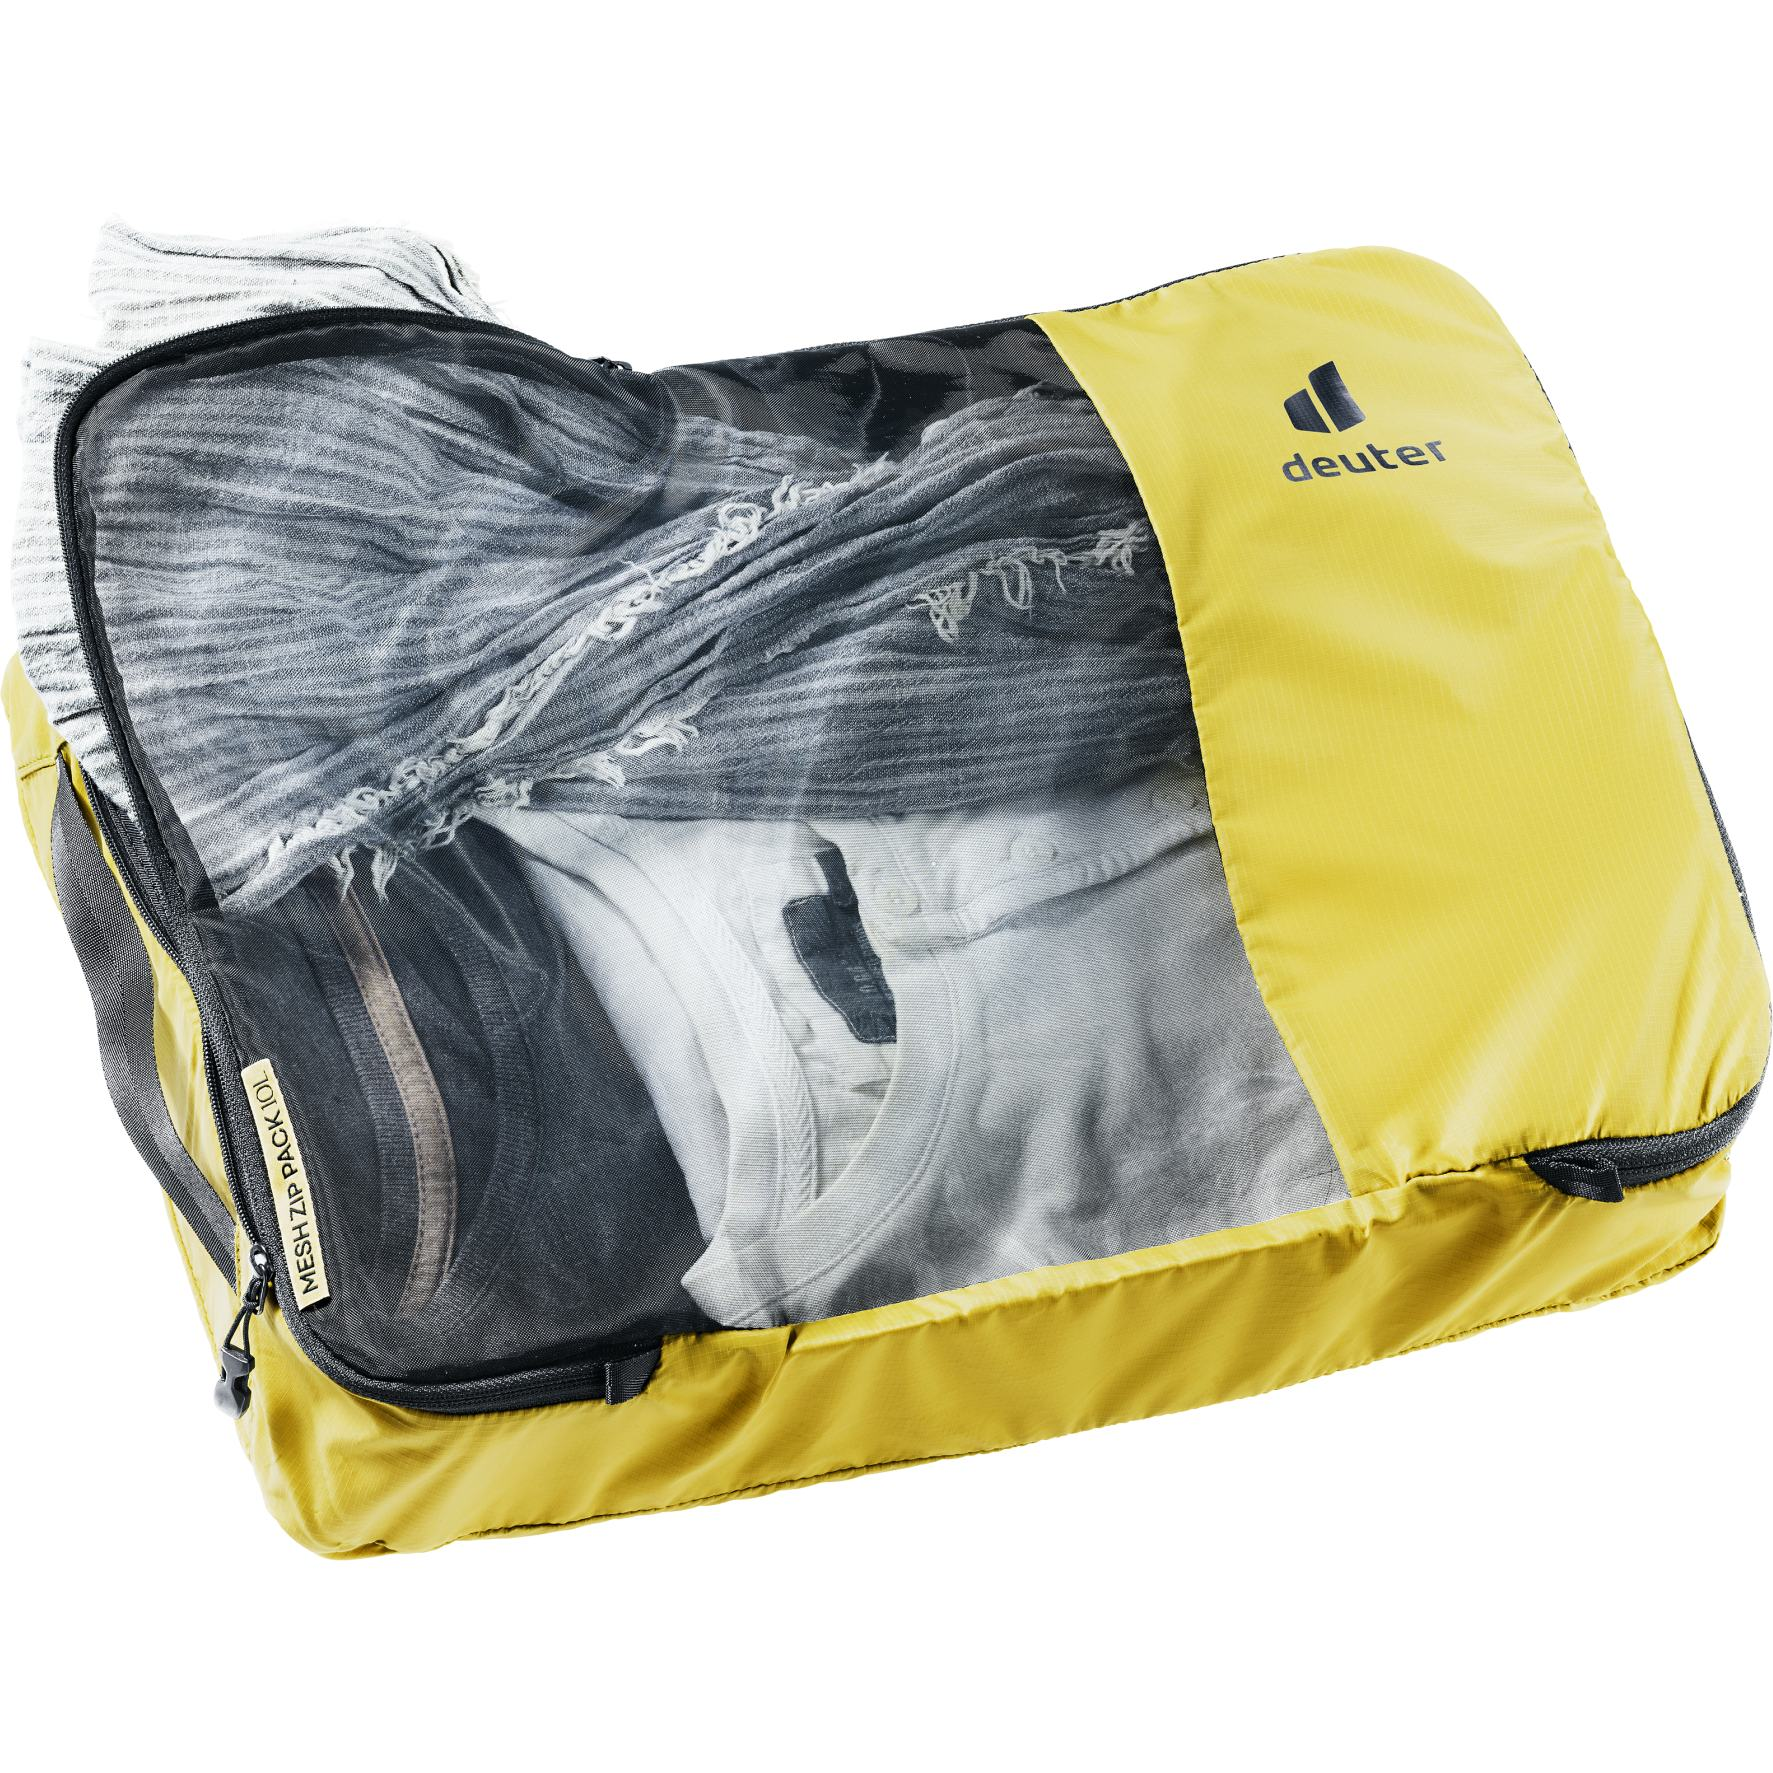 Image of Deuter Mesh Zip Pack 10 liters - turmeric-black